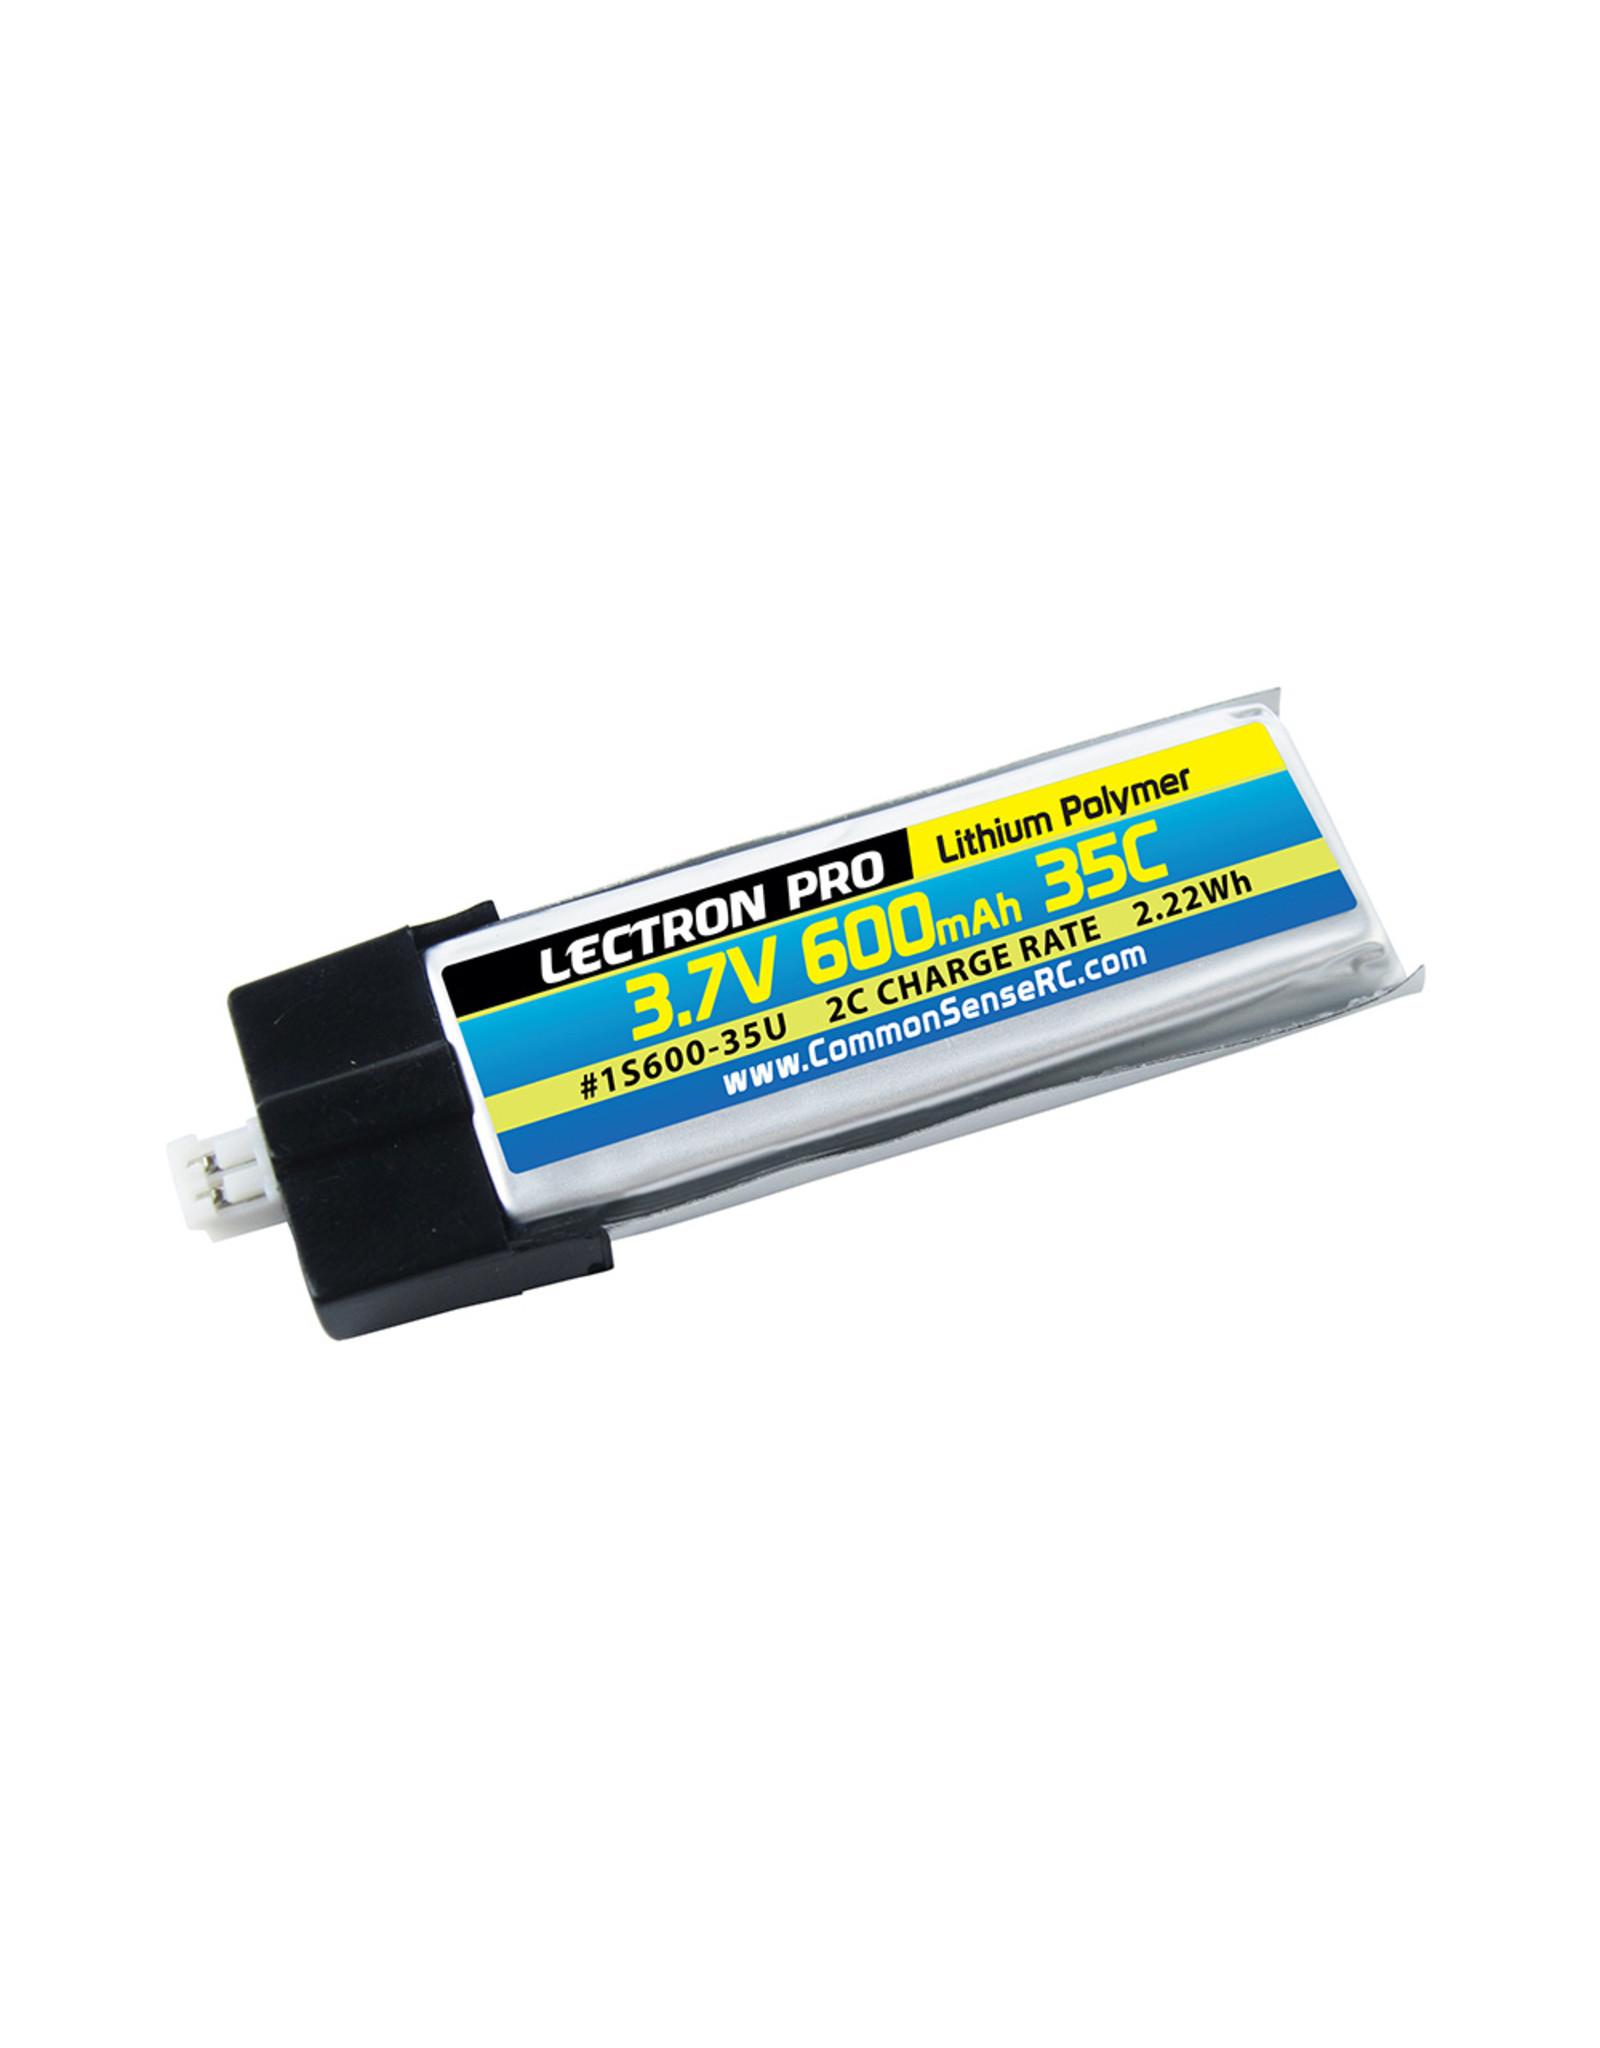 Common Sense RC 1S600-35U - 3.7V 600mAh 35C Lipo Battery with UMX Connector